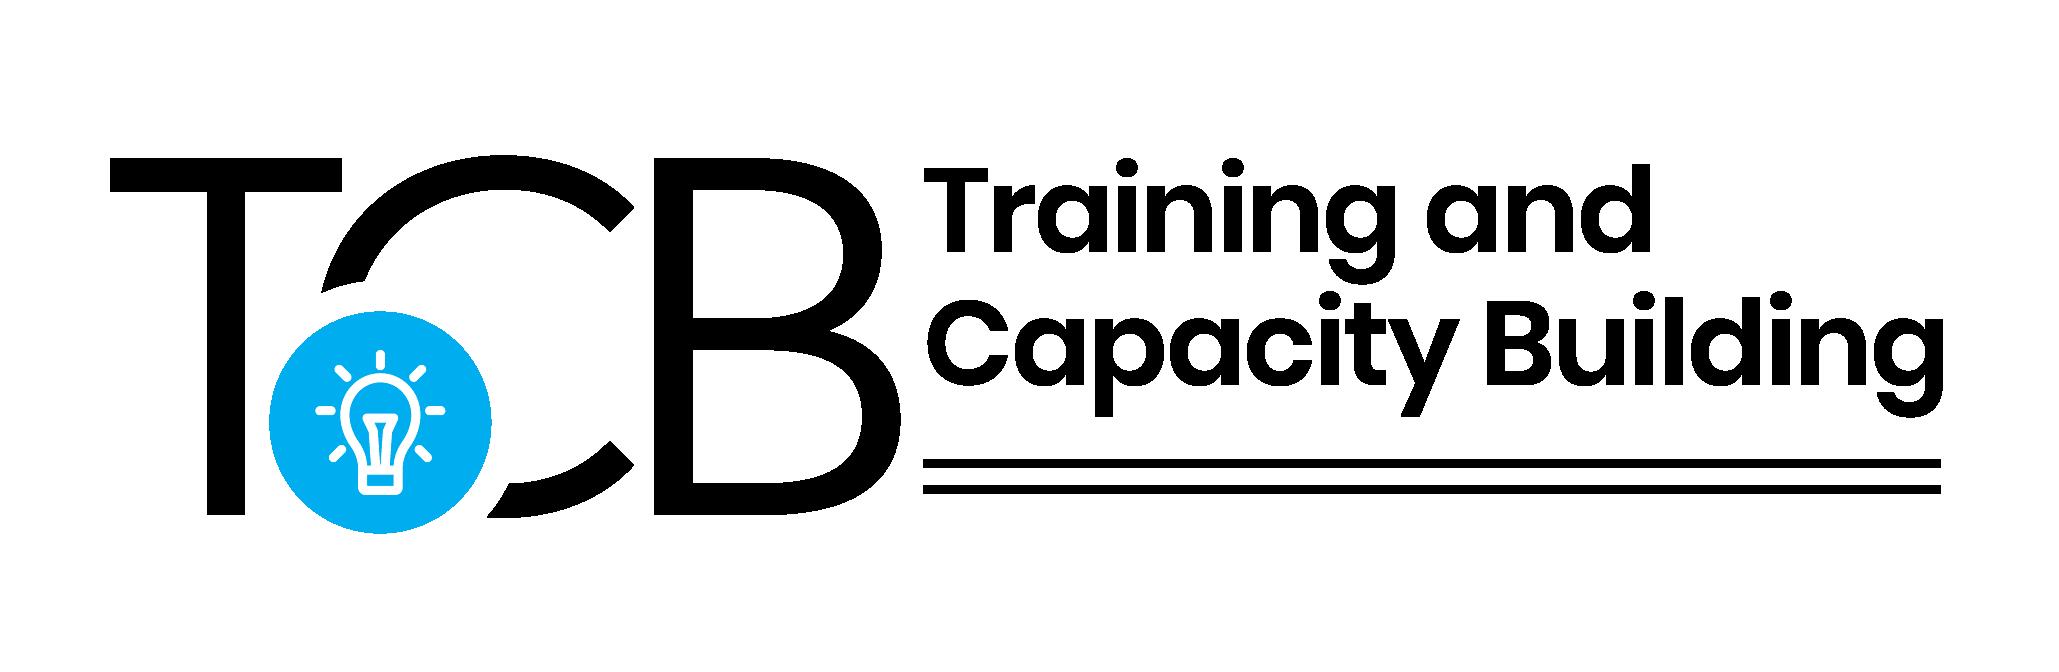 MSME Logo Updated